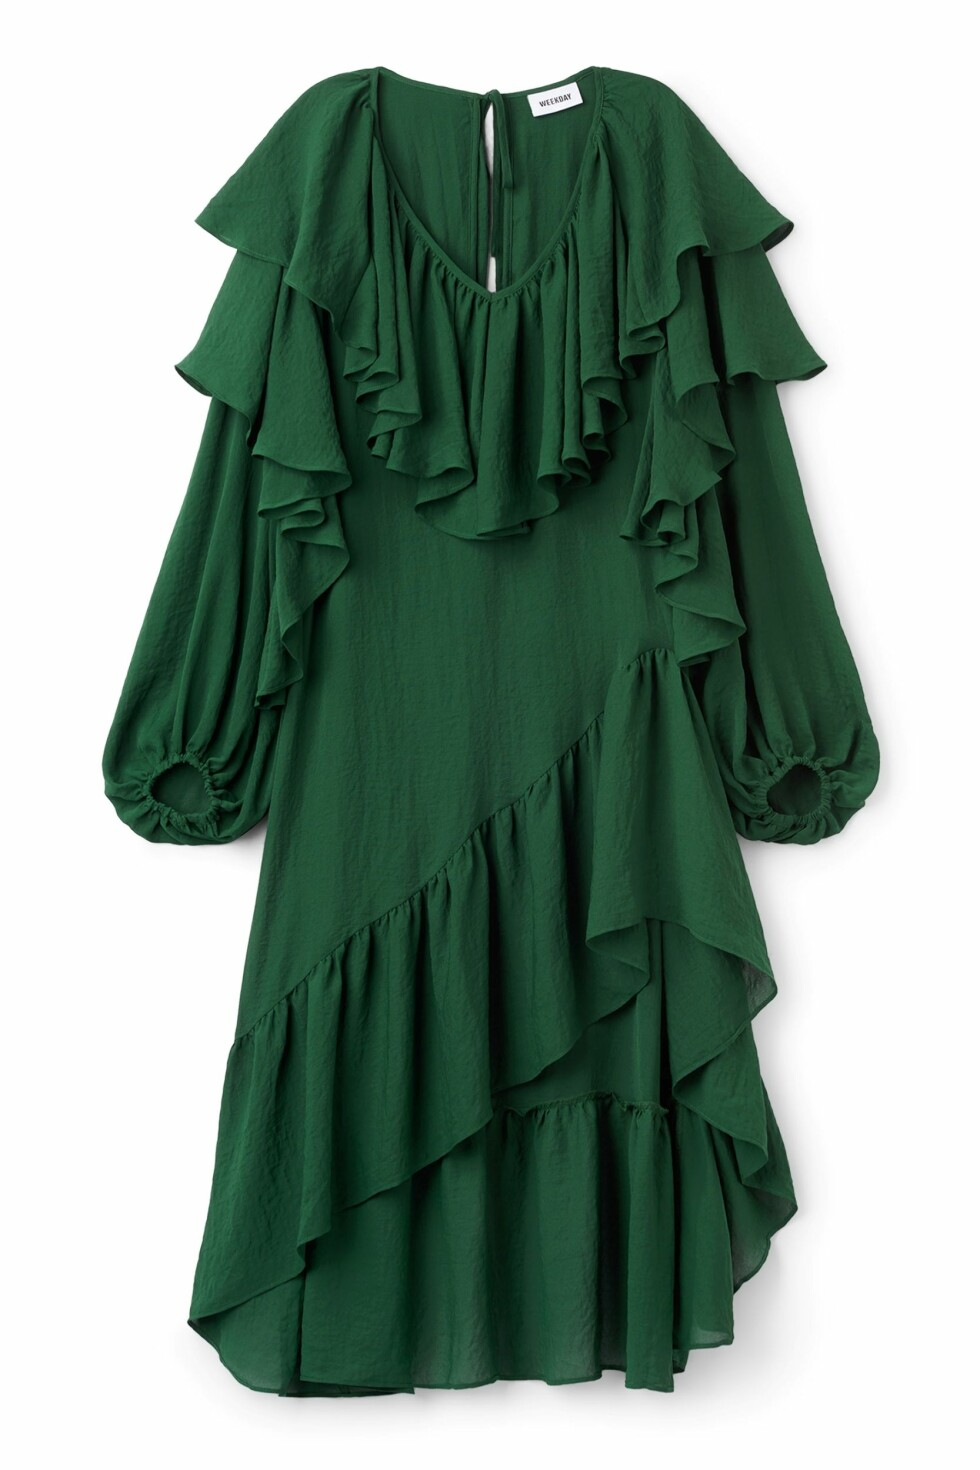 Kjole fra Weekday |600,-| http://shop.weekday.com/se/Womens_shop/Dresses_Jumpsuits/Max_Dress/542434-14466786.1#c-47958